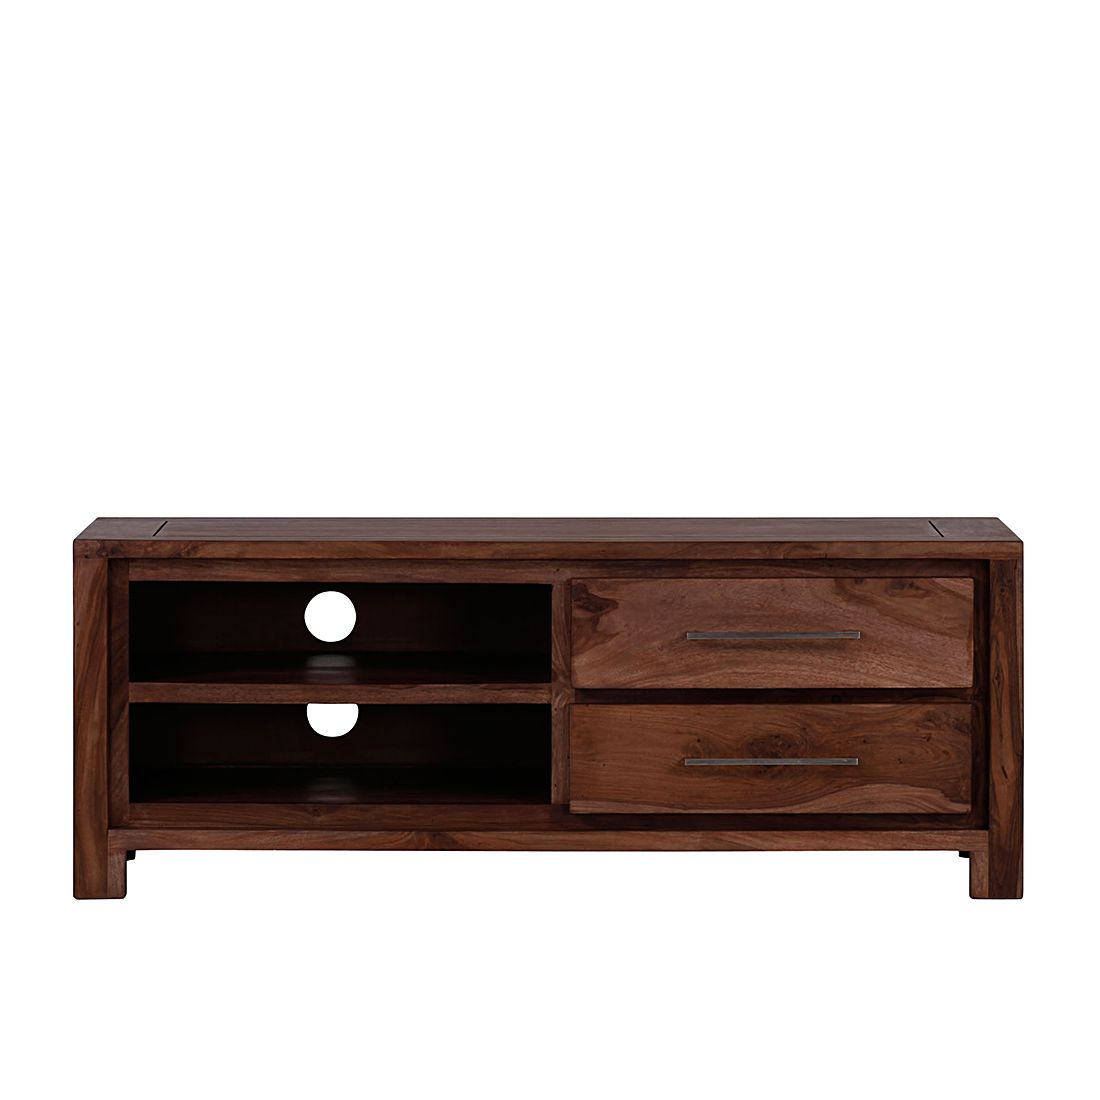 sheesham tv preis vergleich 2016. Black Bedroom Furniture Sets. Home Design Ideas